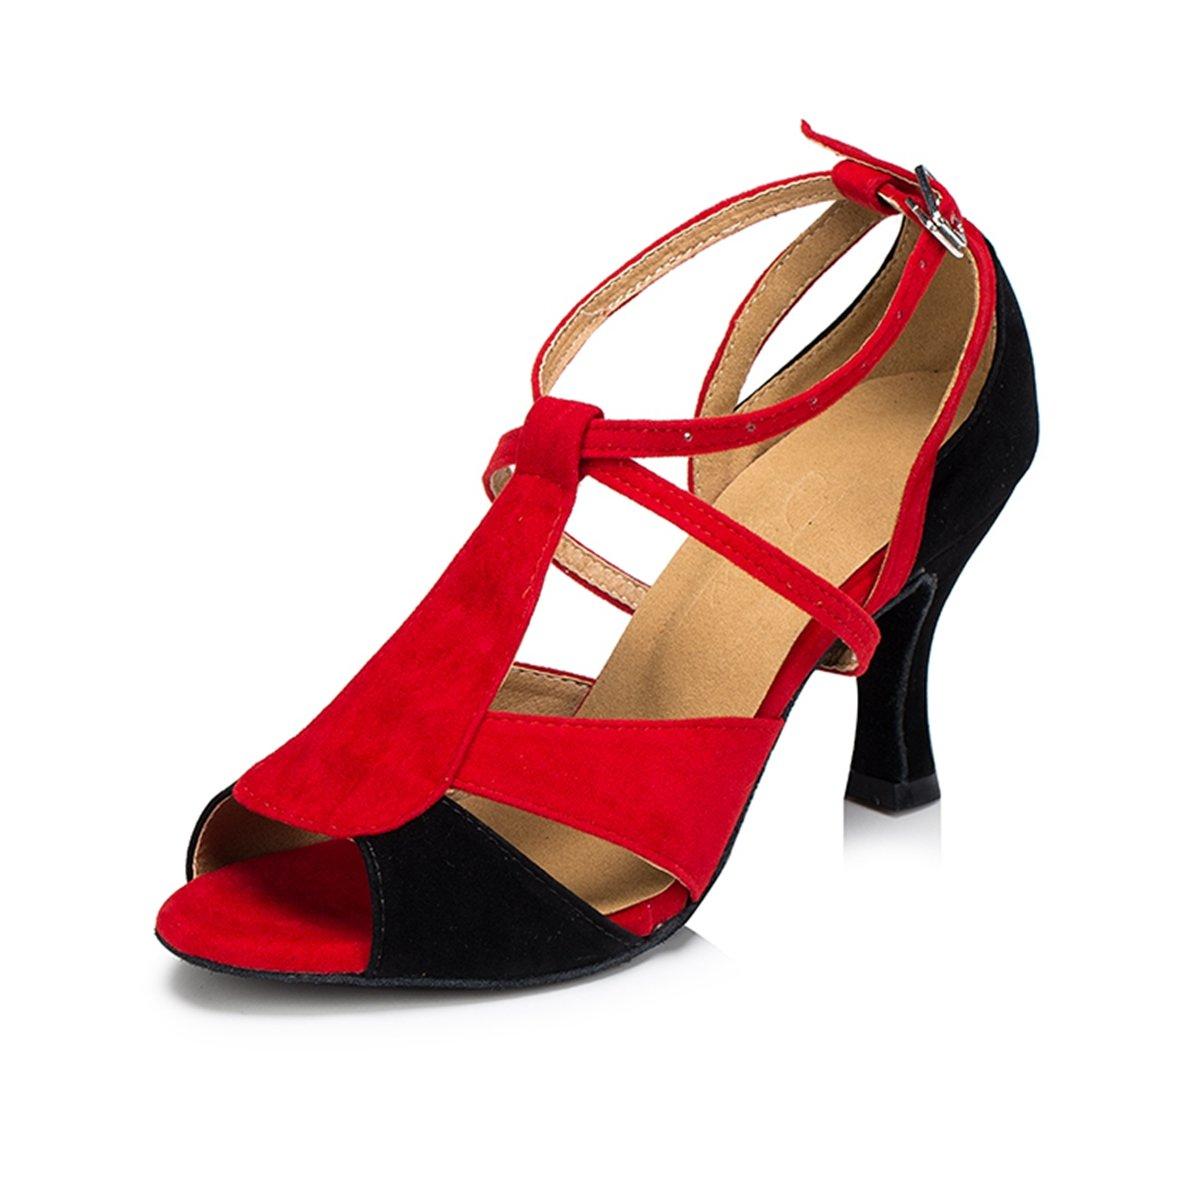 Miyoopark Womens Closed Toe Leather Latin Tango Dance Shoes Ballroom Dancing Evening Pumps